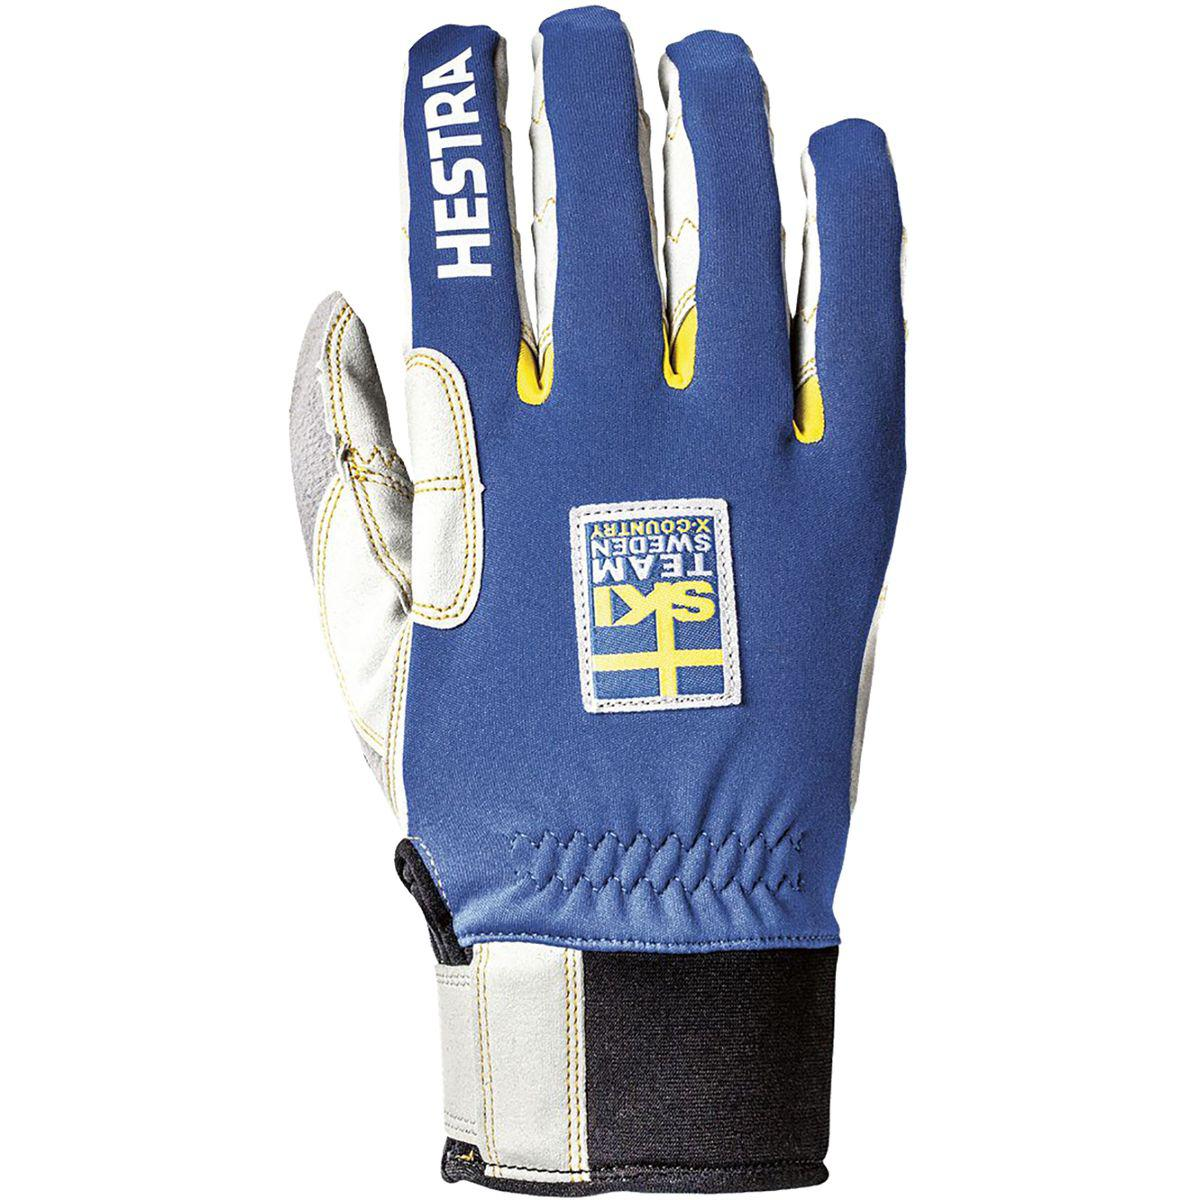 hestra-Red-Ergo-Grip-Windstopper-Race-Glove.jpg